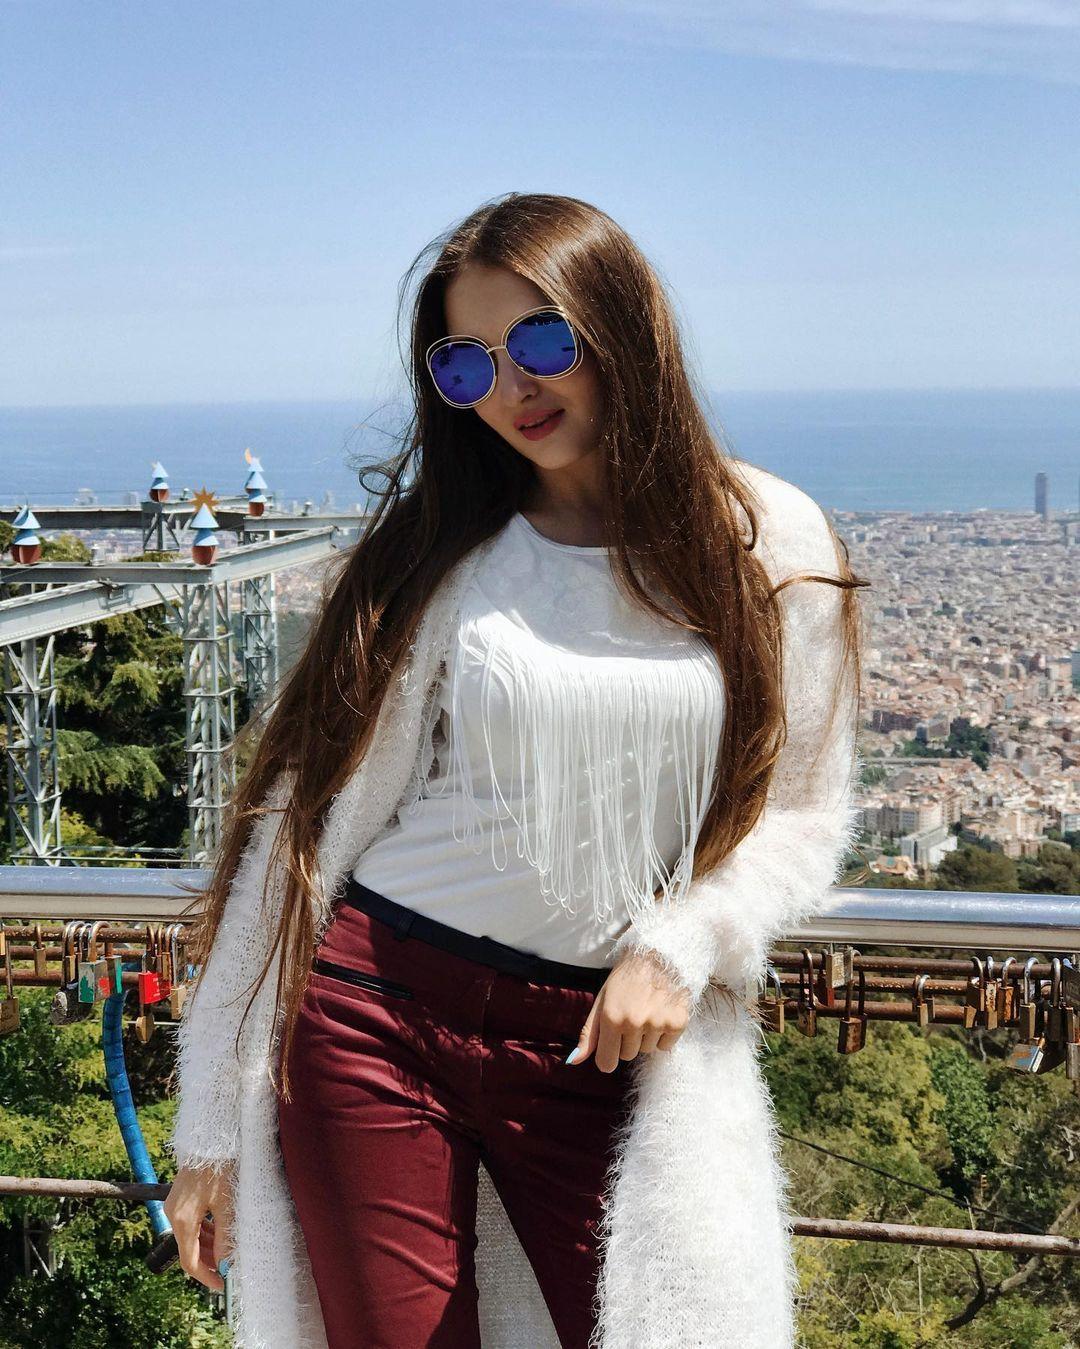 World Stylish Girl DP